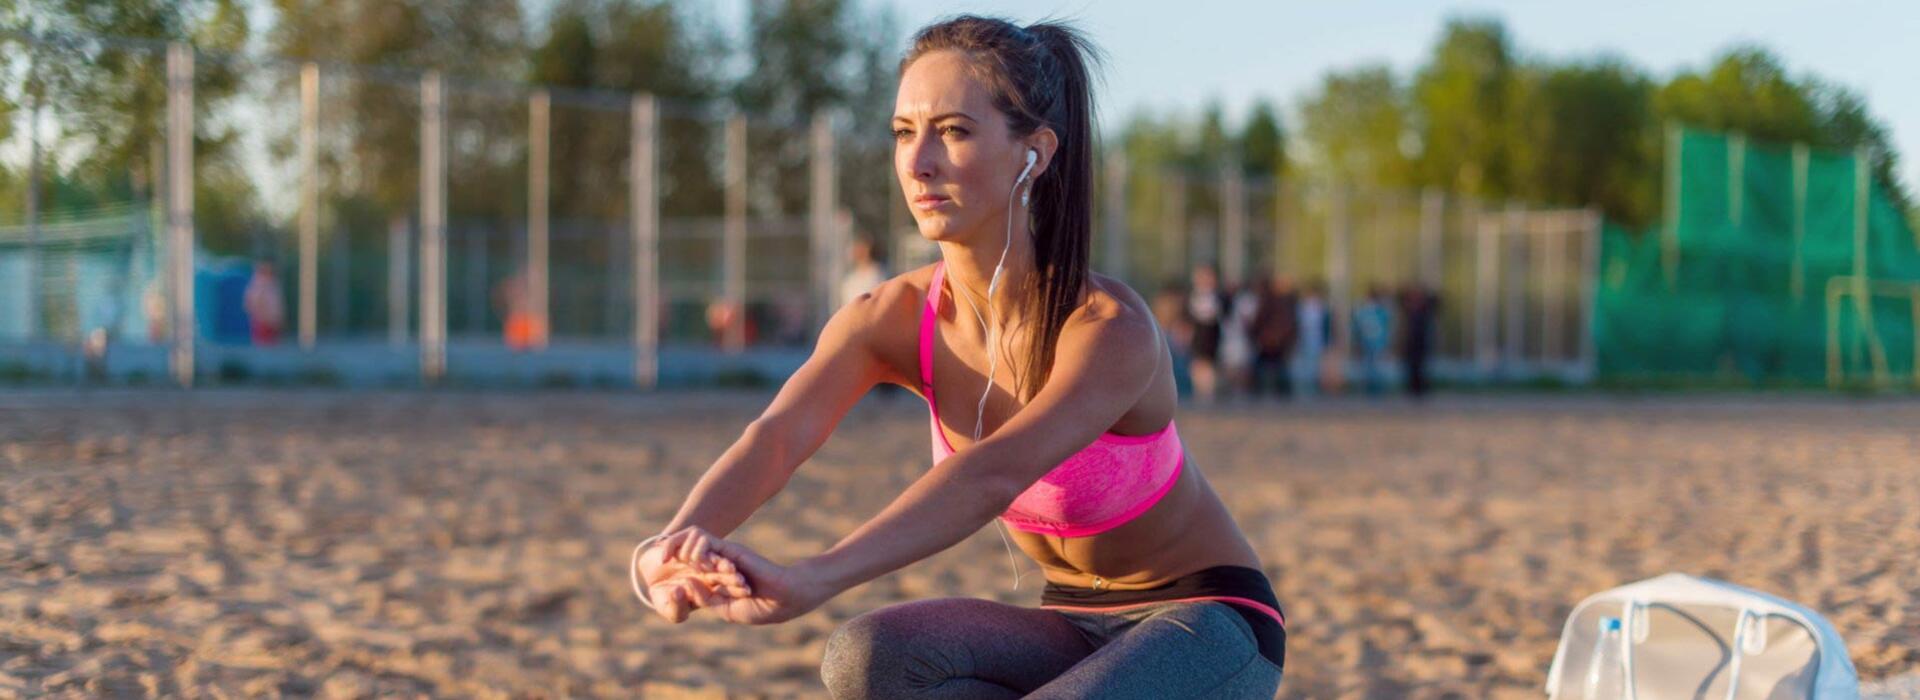 hotelvictoria en beach-fitness 015